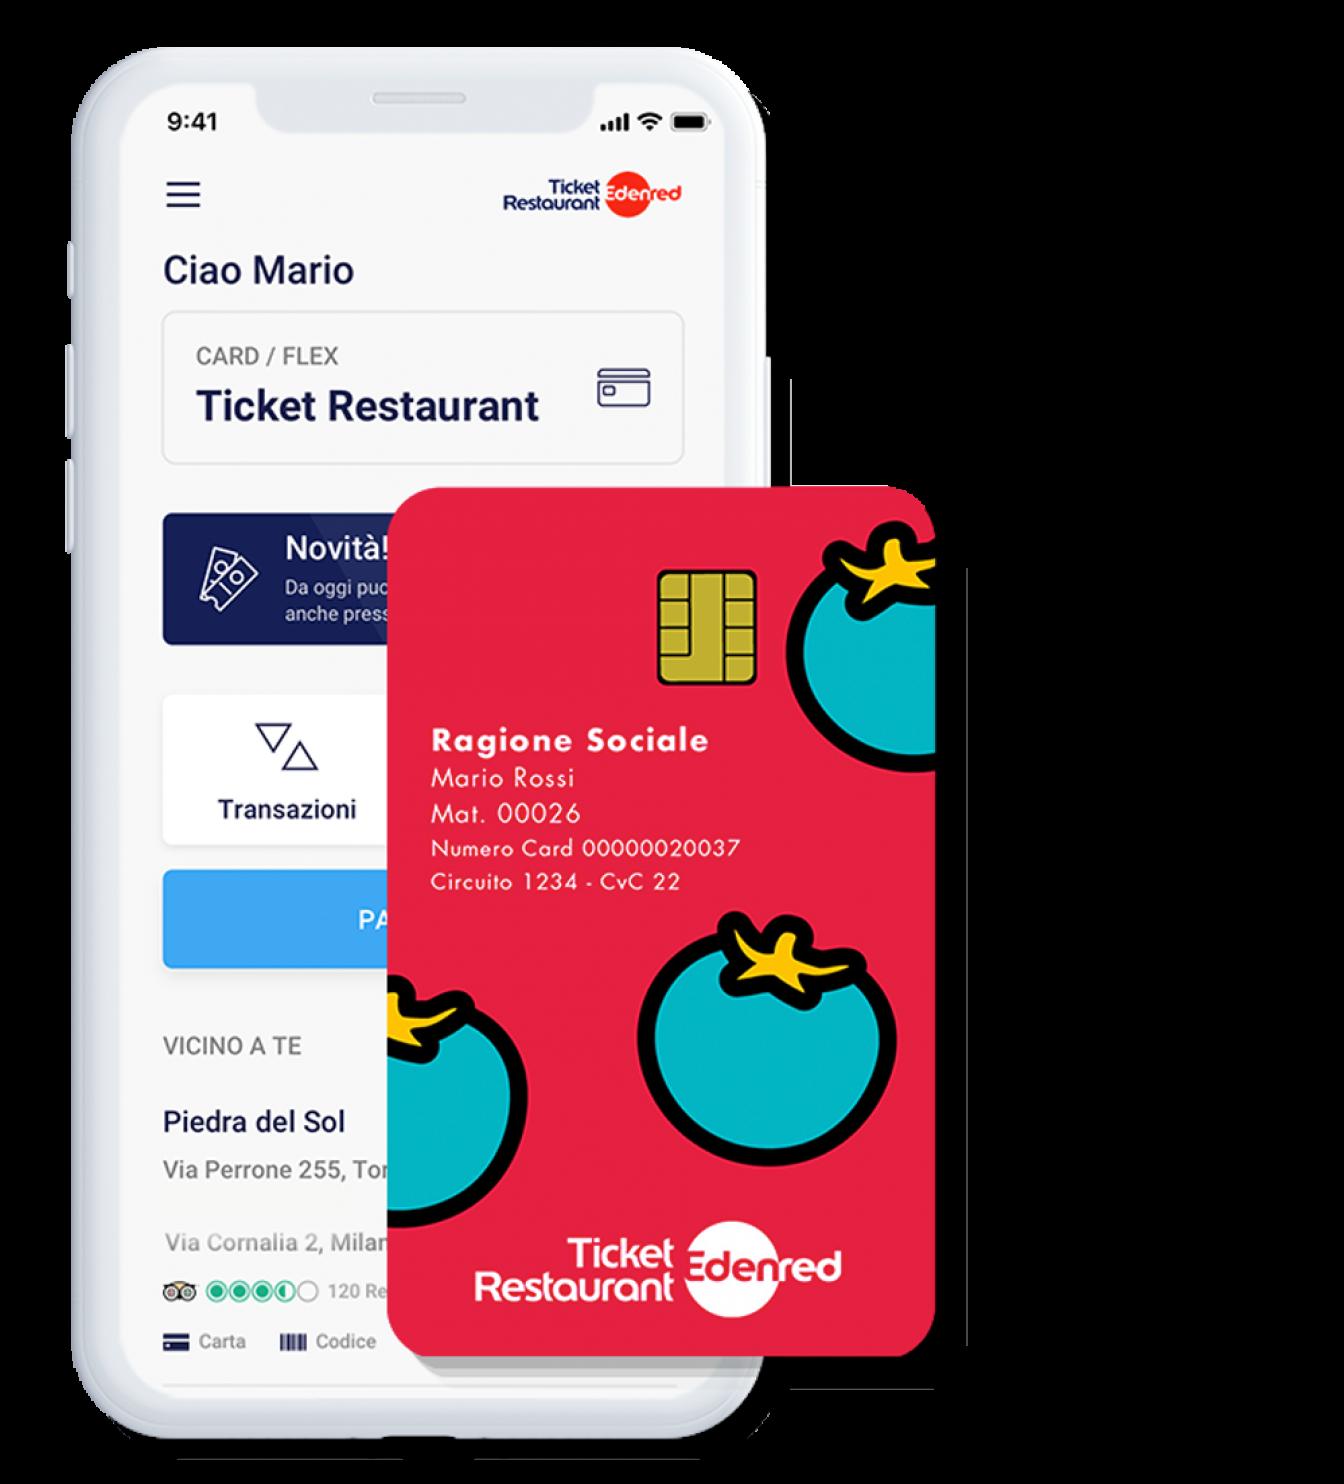 buono-pasto-ticket-restaurant-canteen-202105